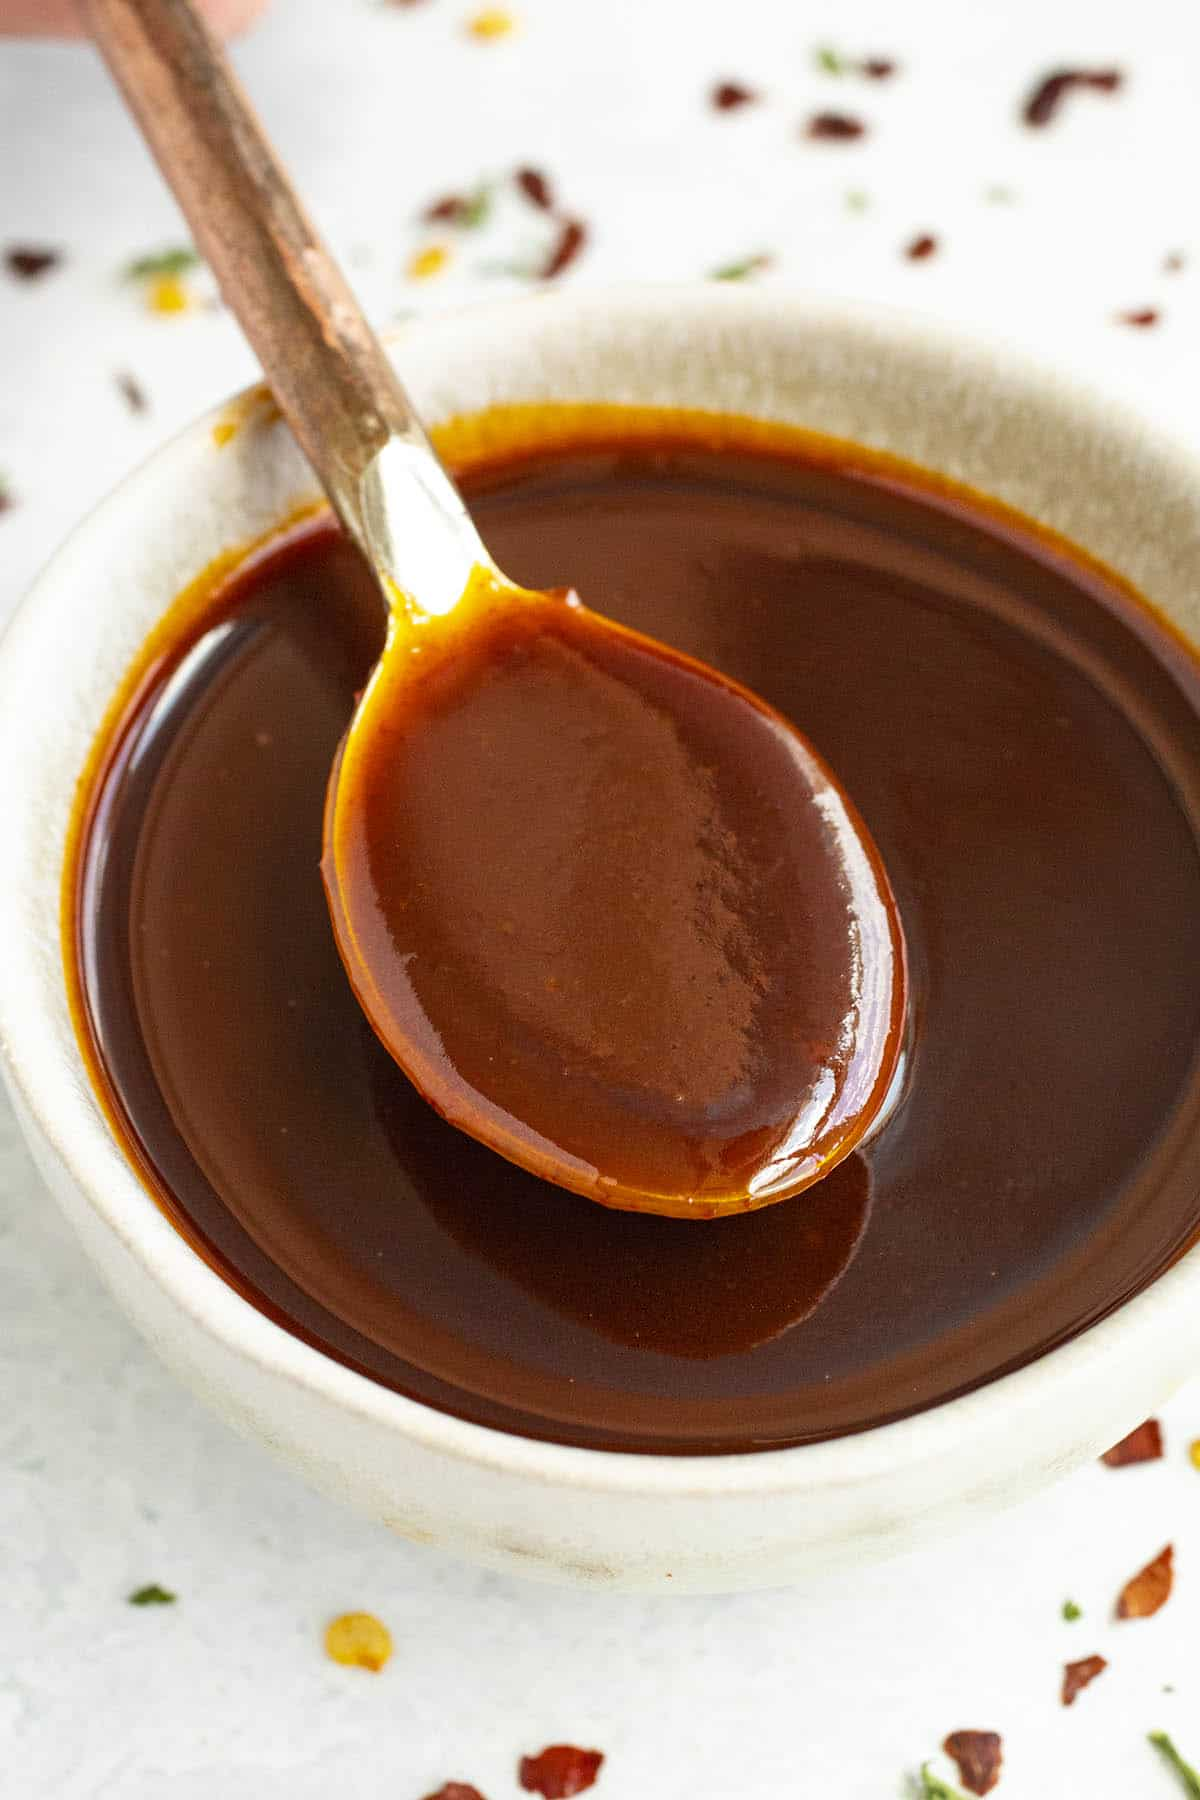 Gochujang Sauce on a spoon, ready to taste